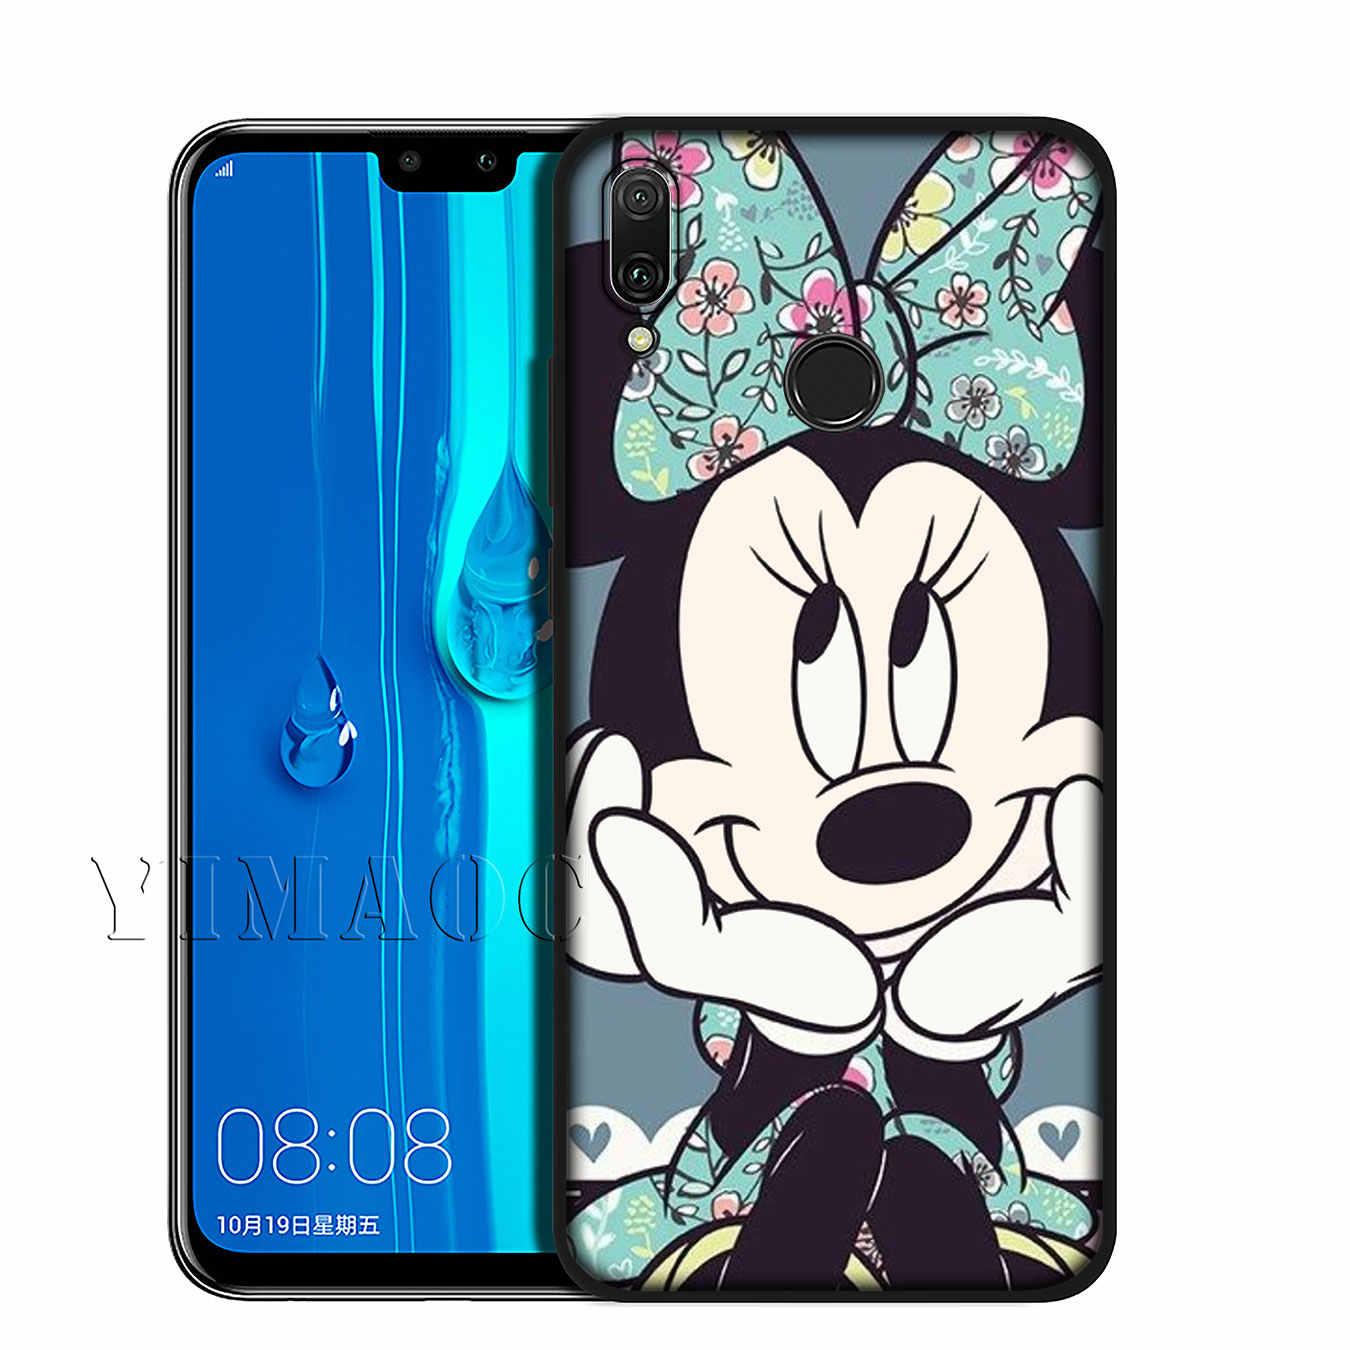 Мягкий чехол YIMAOC с Микки и Минни Маус для huawei Y9 Y7 Y6 Prime 2019 Honor 20 8C 8X8 9 9X10 Lite 7C 7X 7A Pro